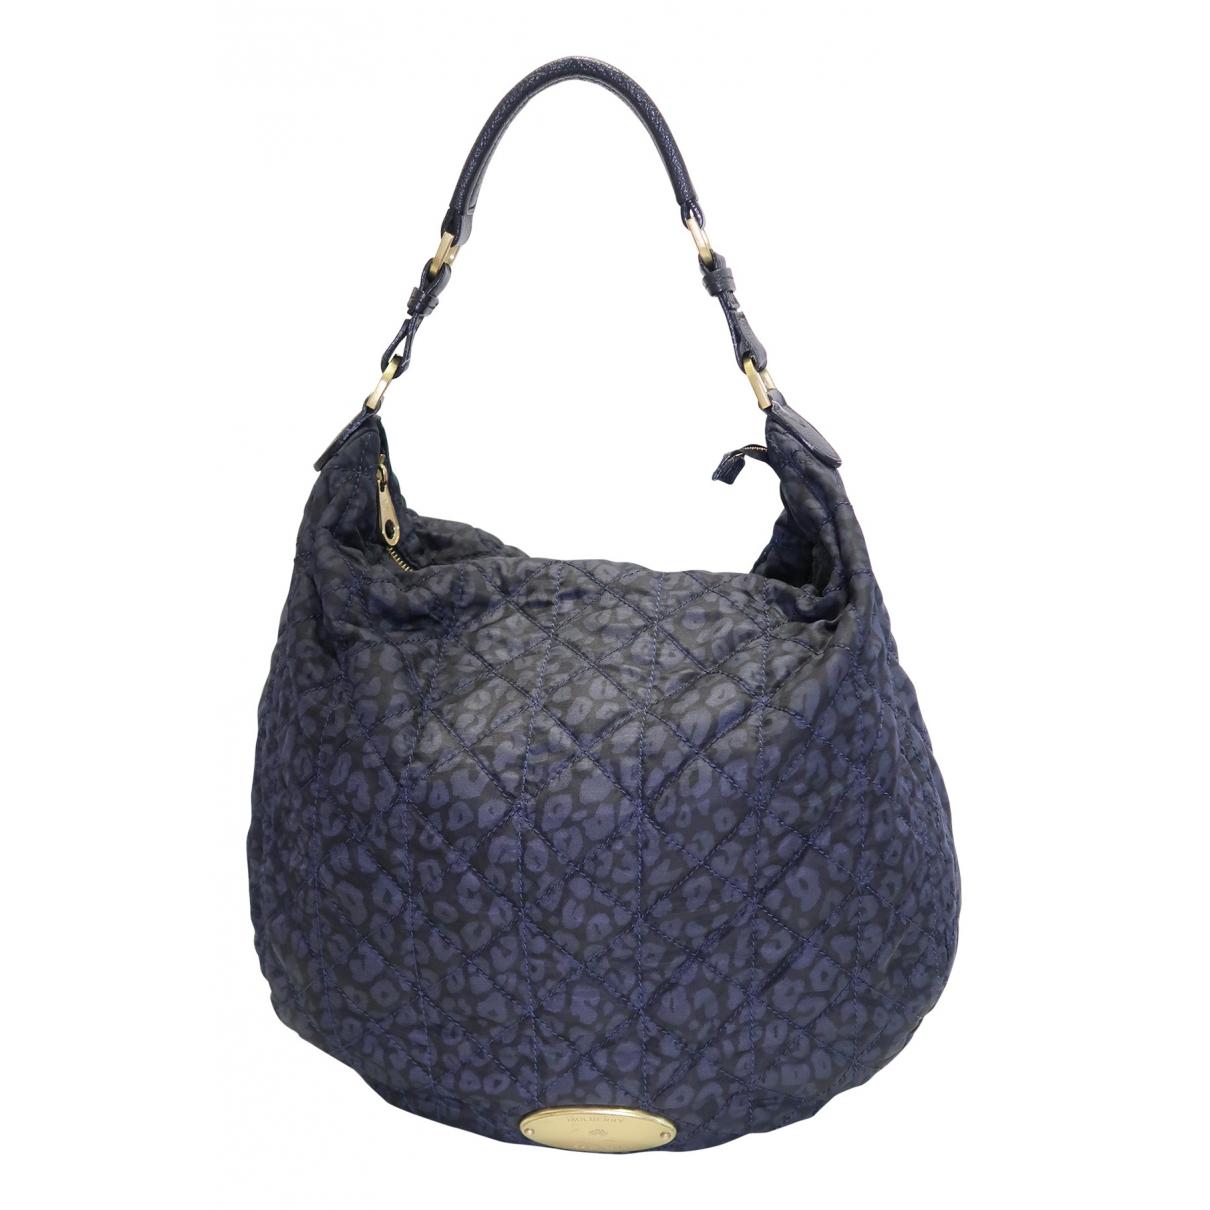 Mulberry N Multicolour Leather handbag for Women N